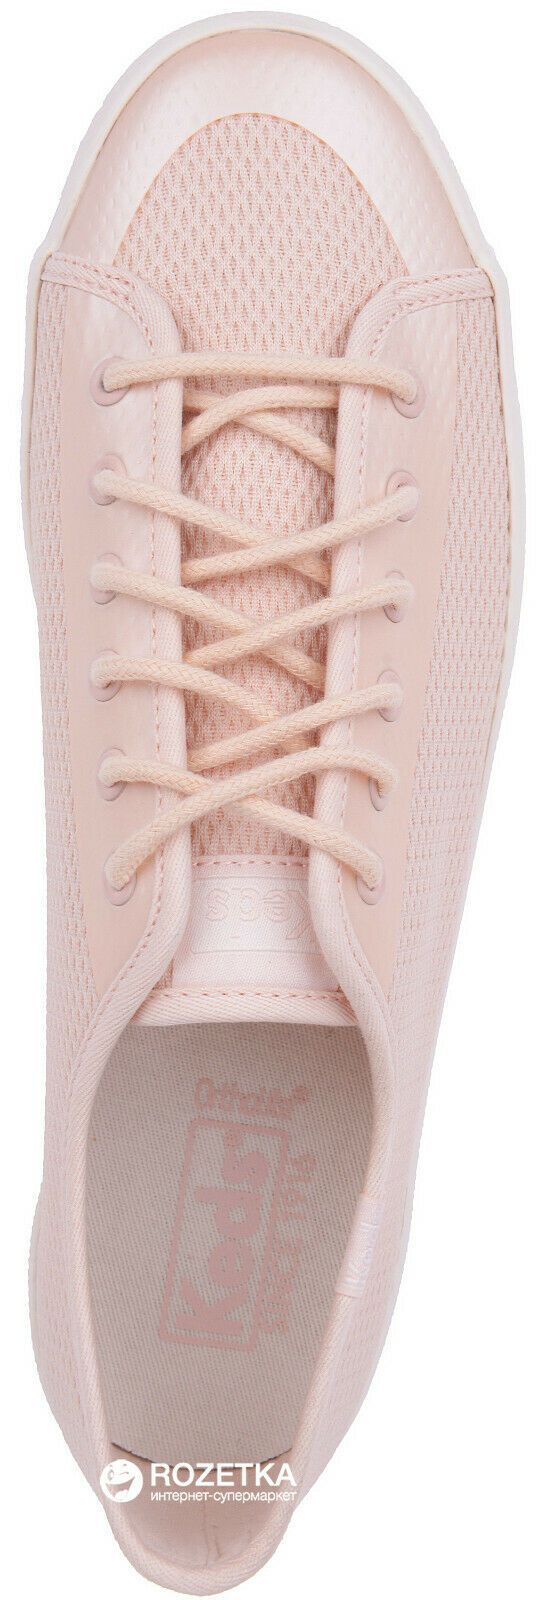 Keds WF58099 Women's Kickstart Diamond Mesh Peony Pink Shoes, 8 Med